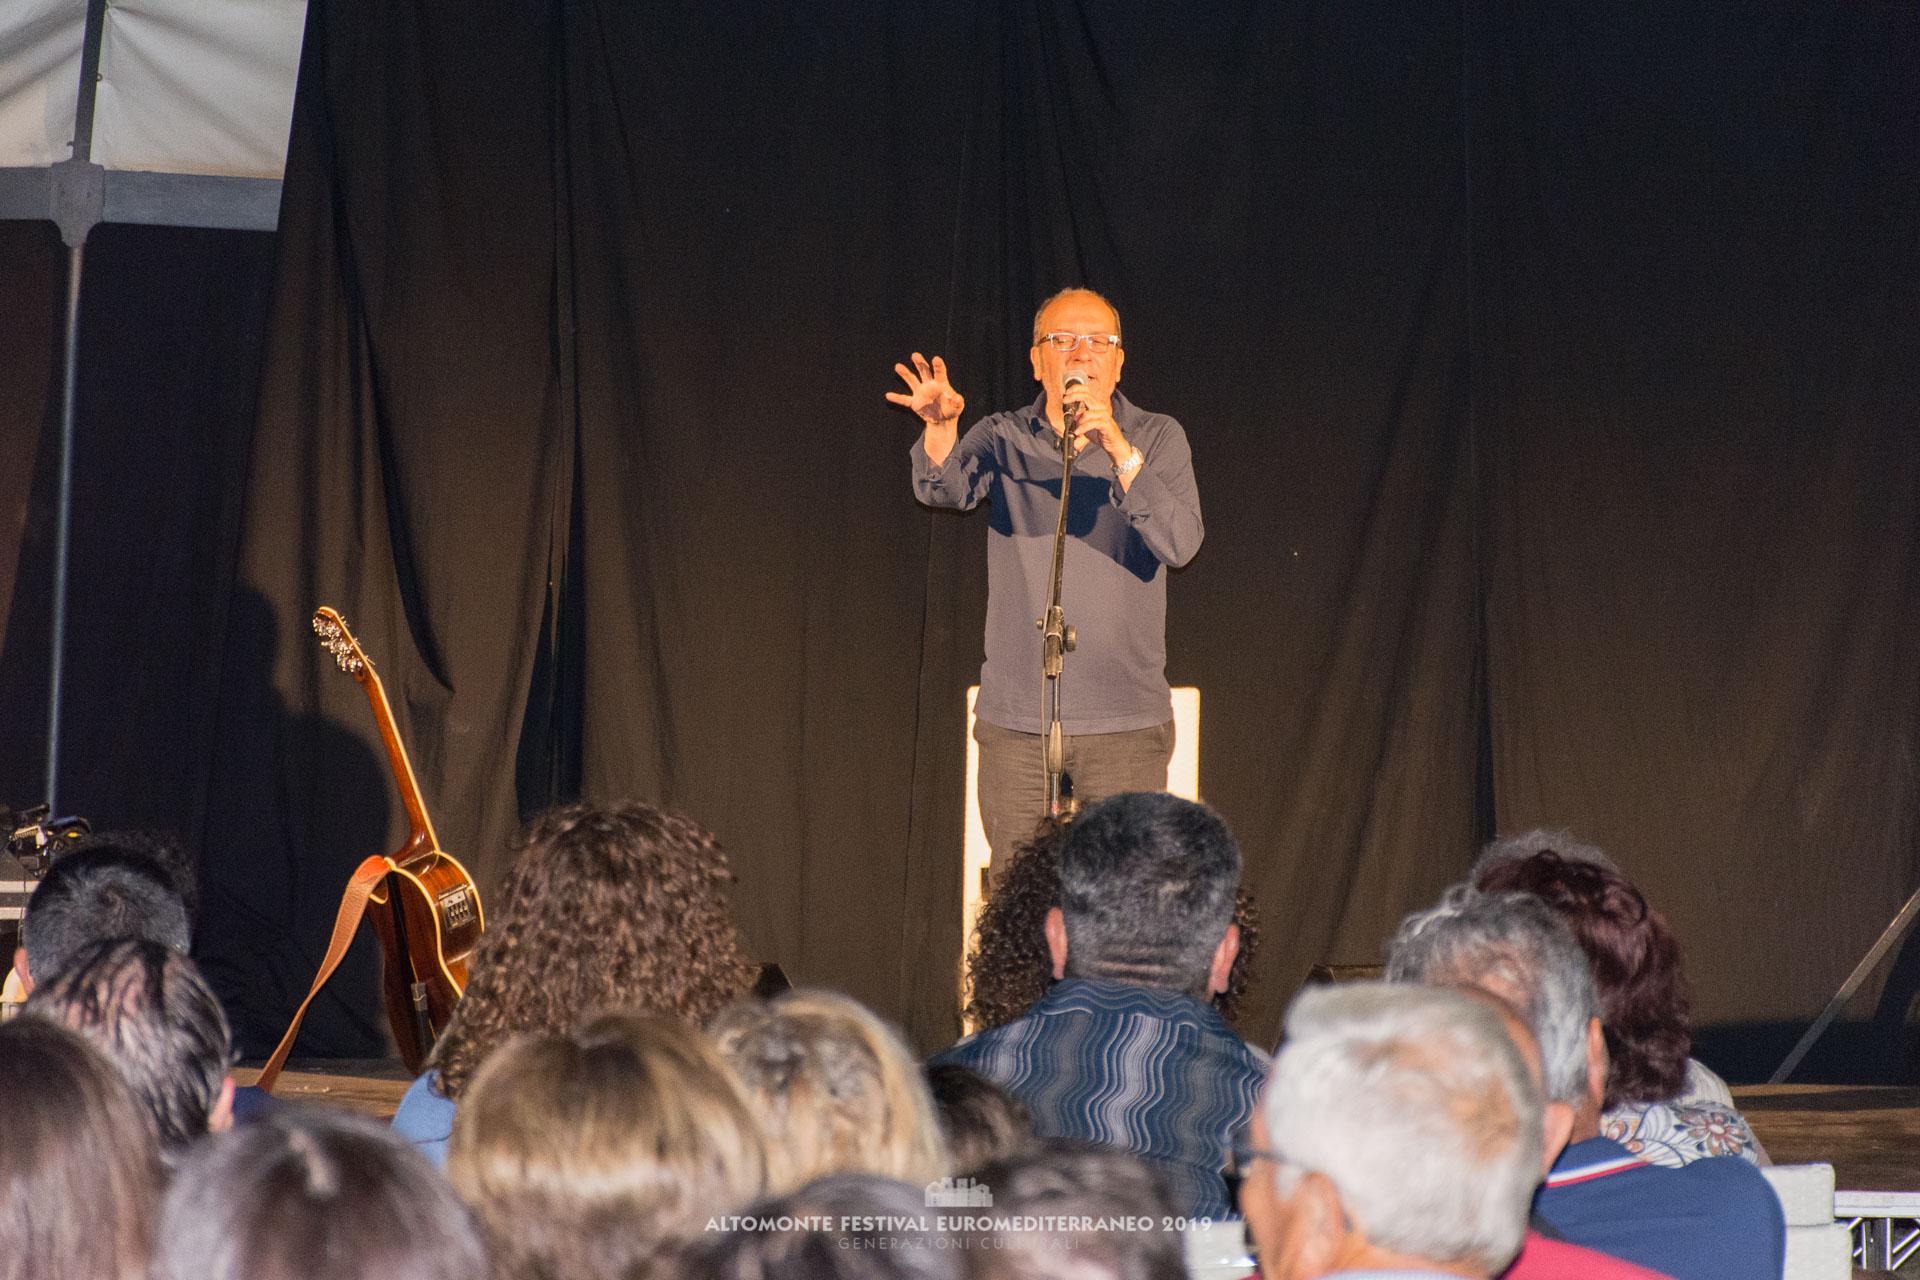 Dario Vergassola > 20 agosto 2019